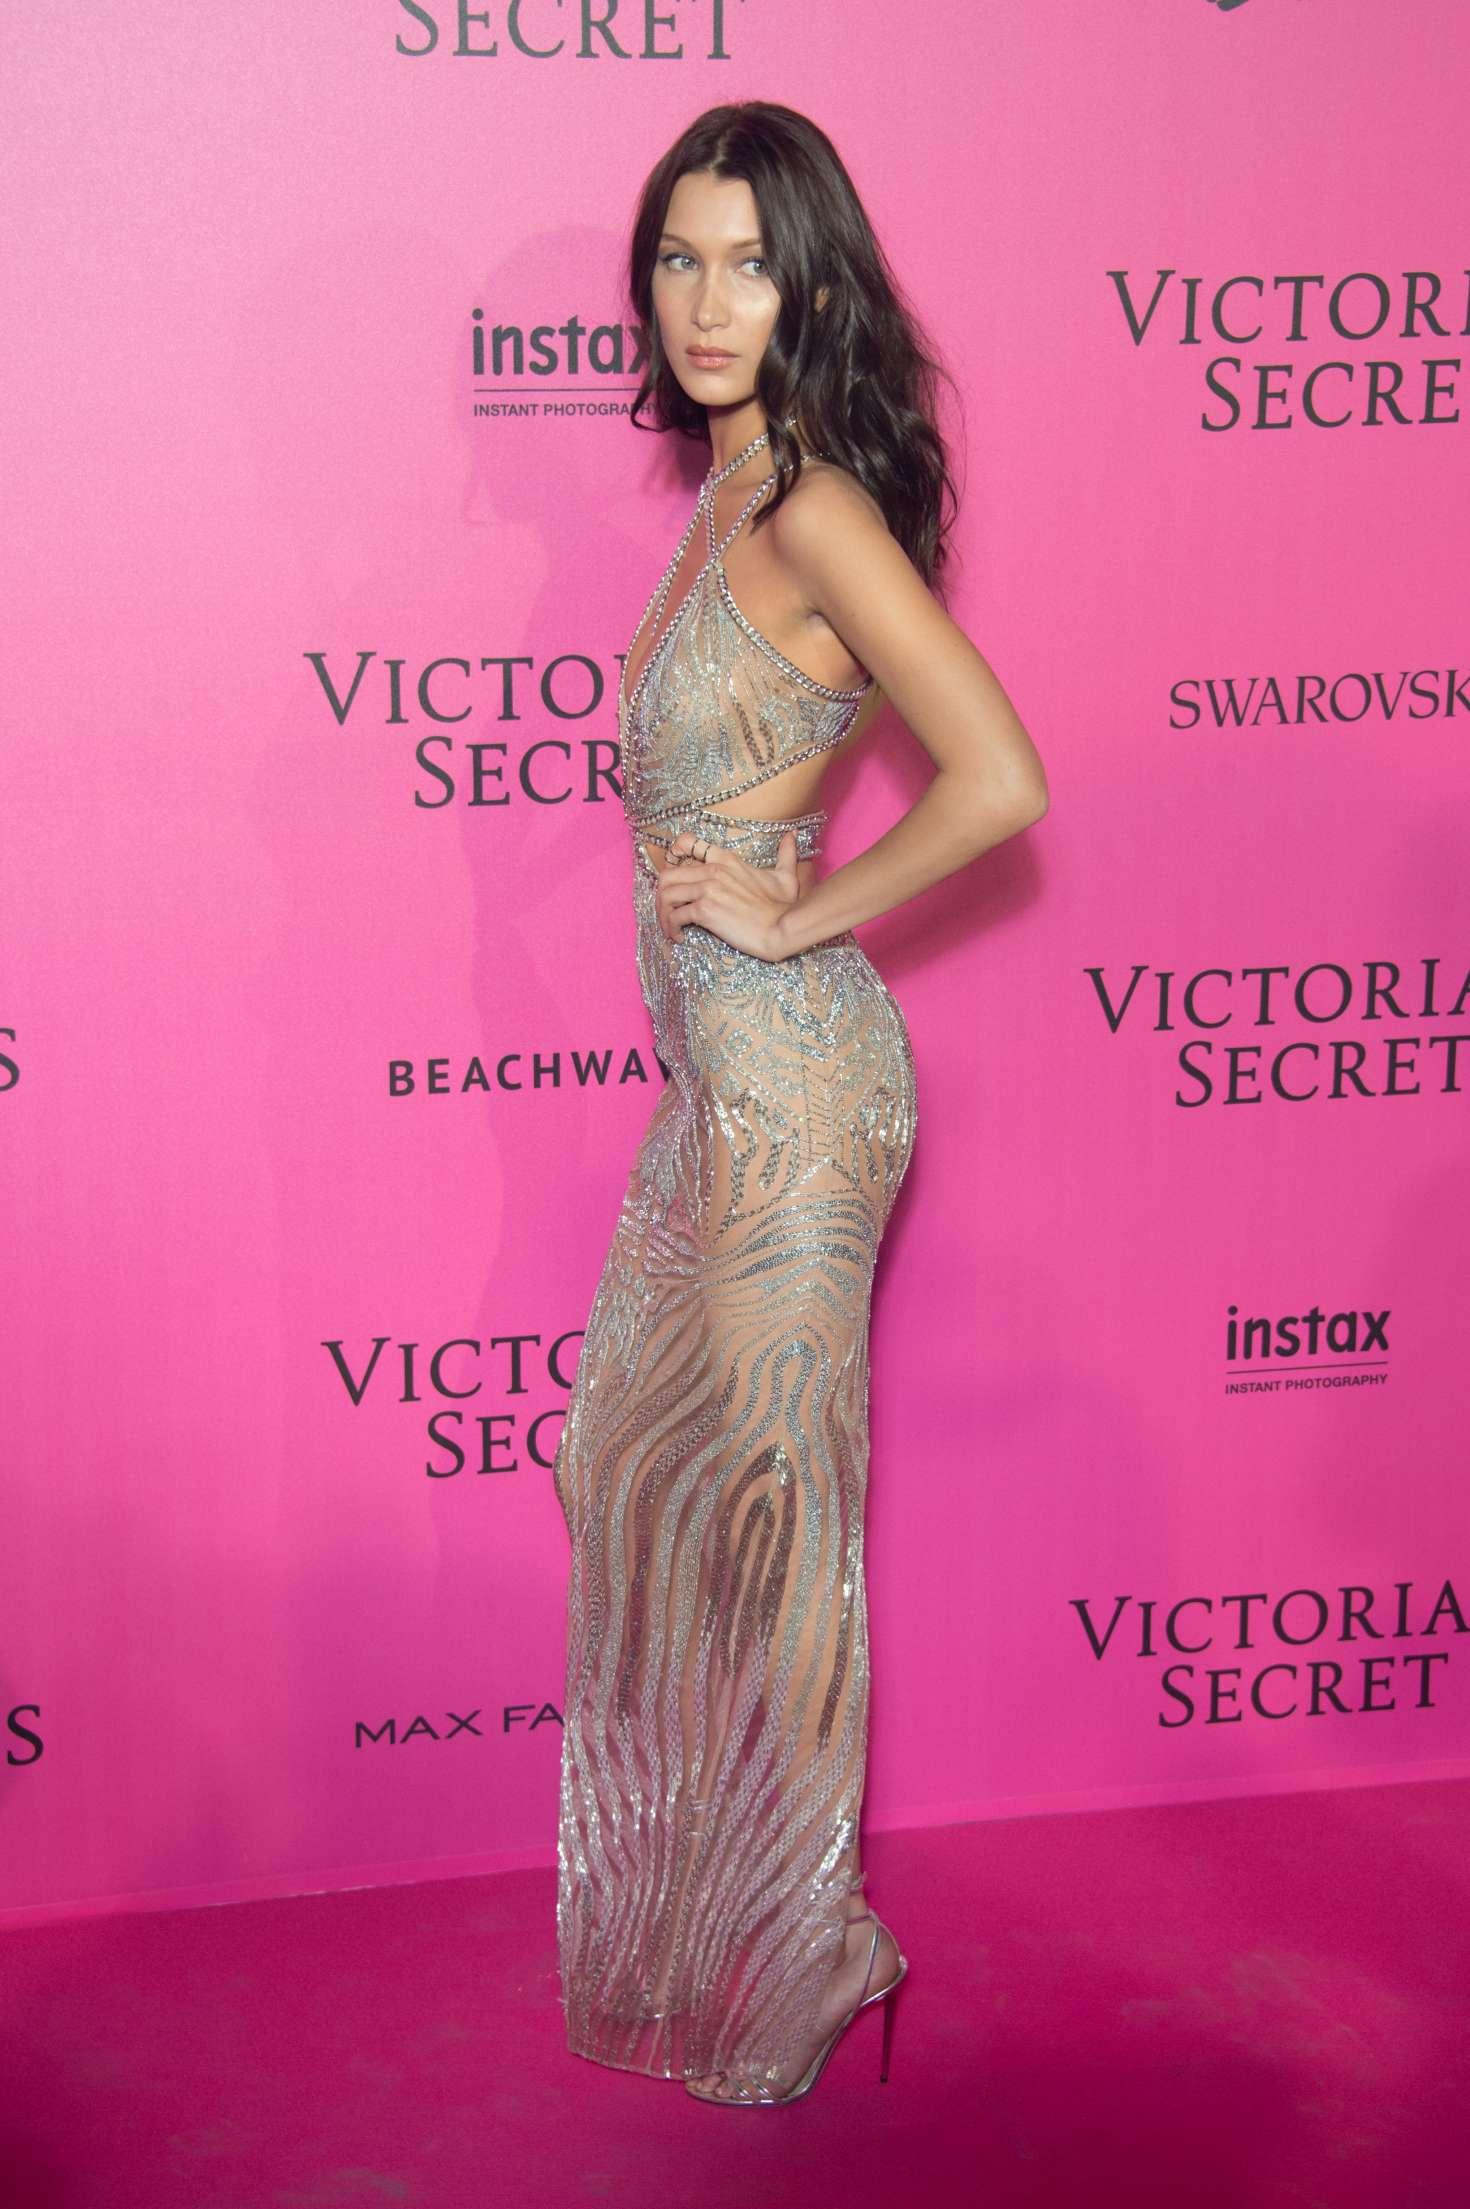 Bella Hadid Victorias Secret Fashion Show 2016 After